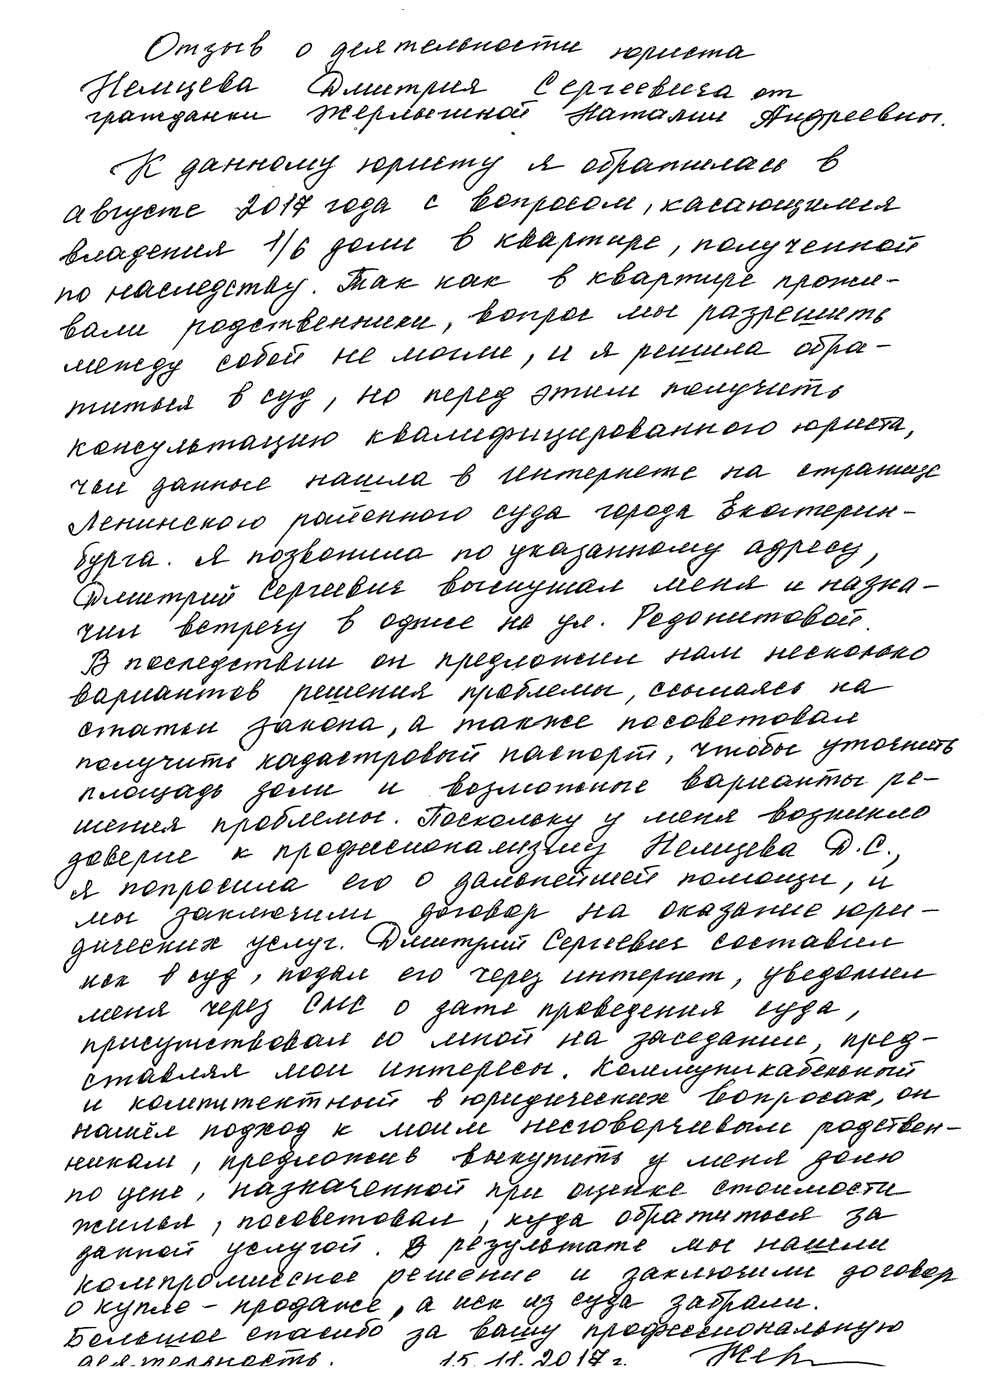 Отзыв об юристе Екатеринбурга